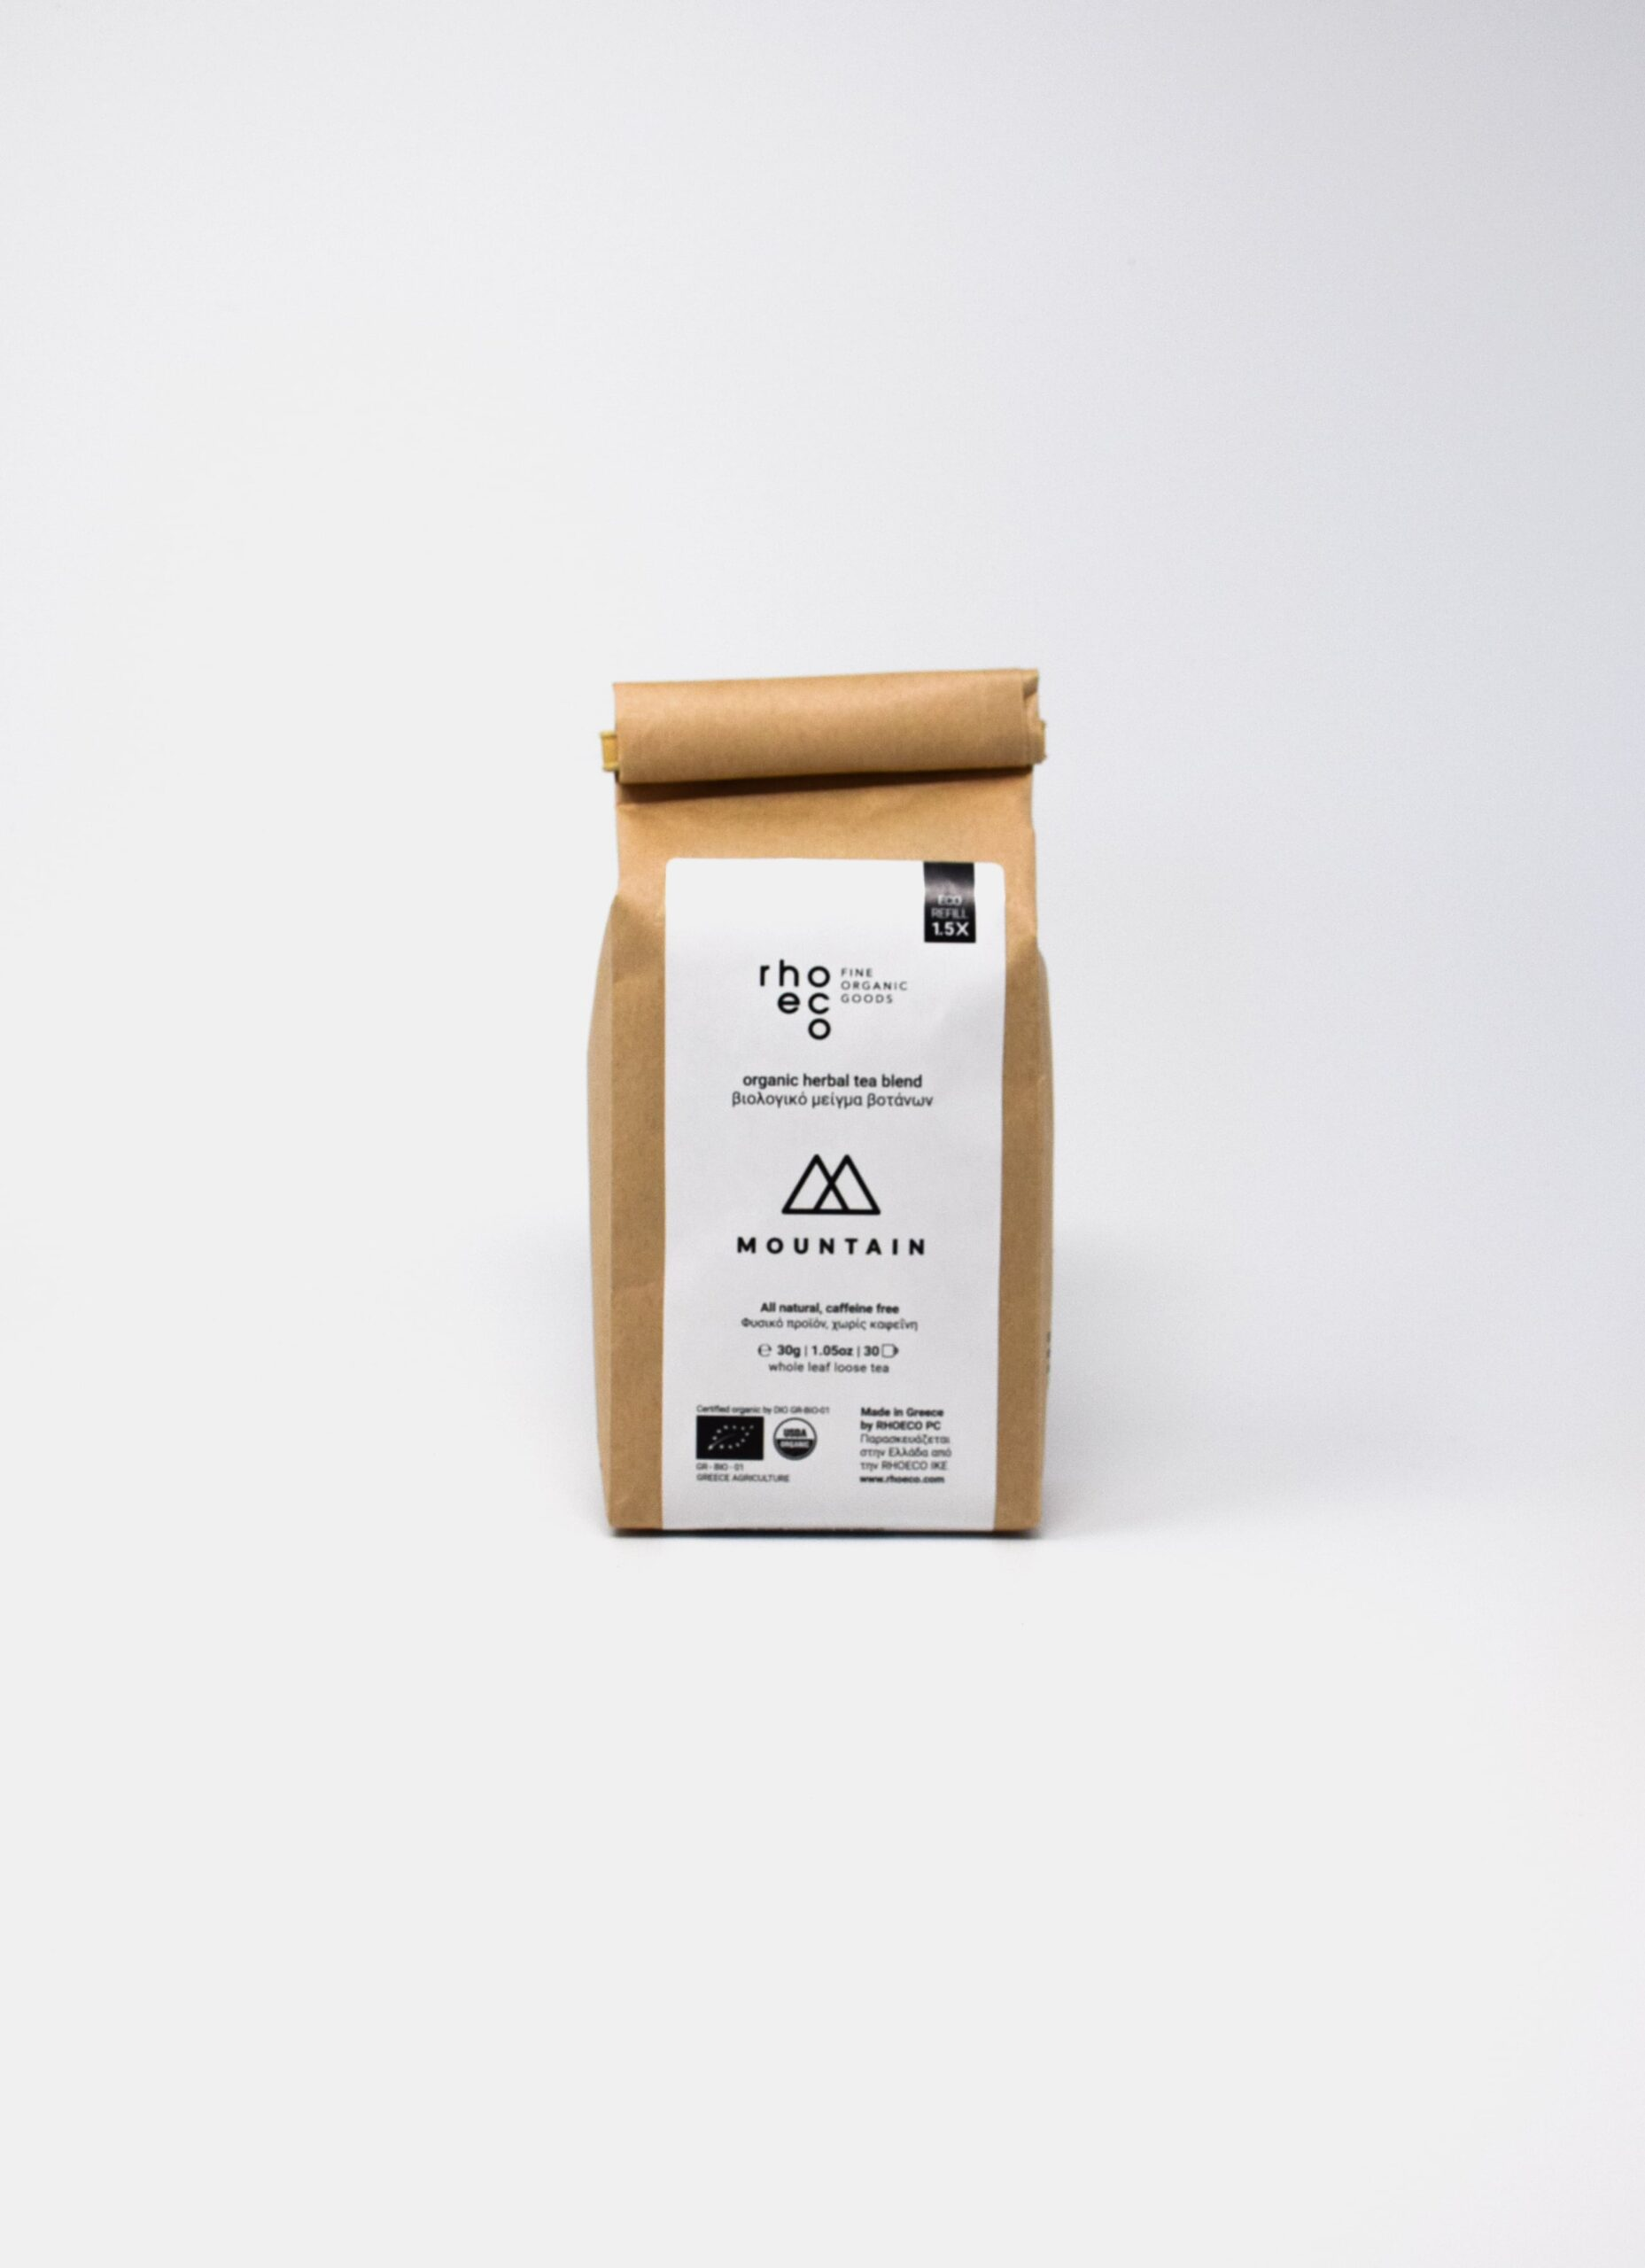 Rhoeco - Organic Tea - Mountain - 53g